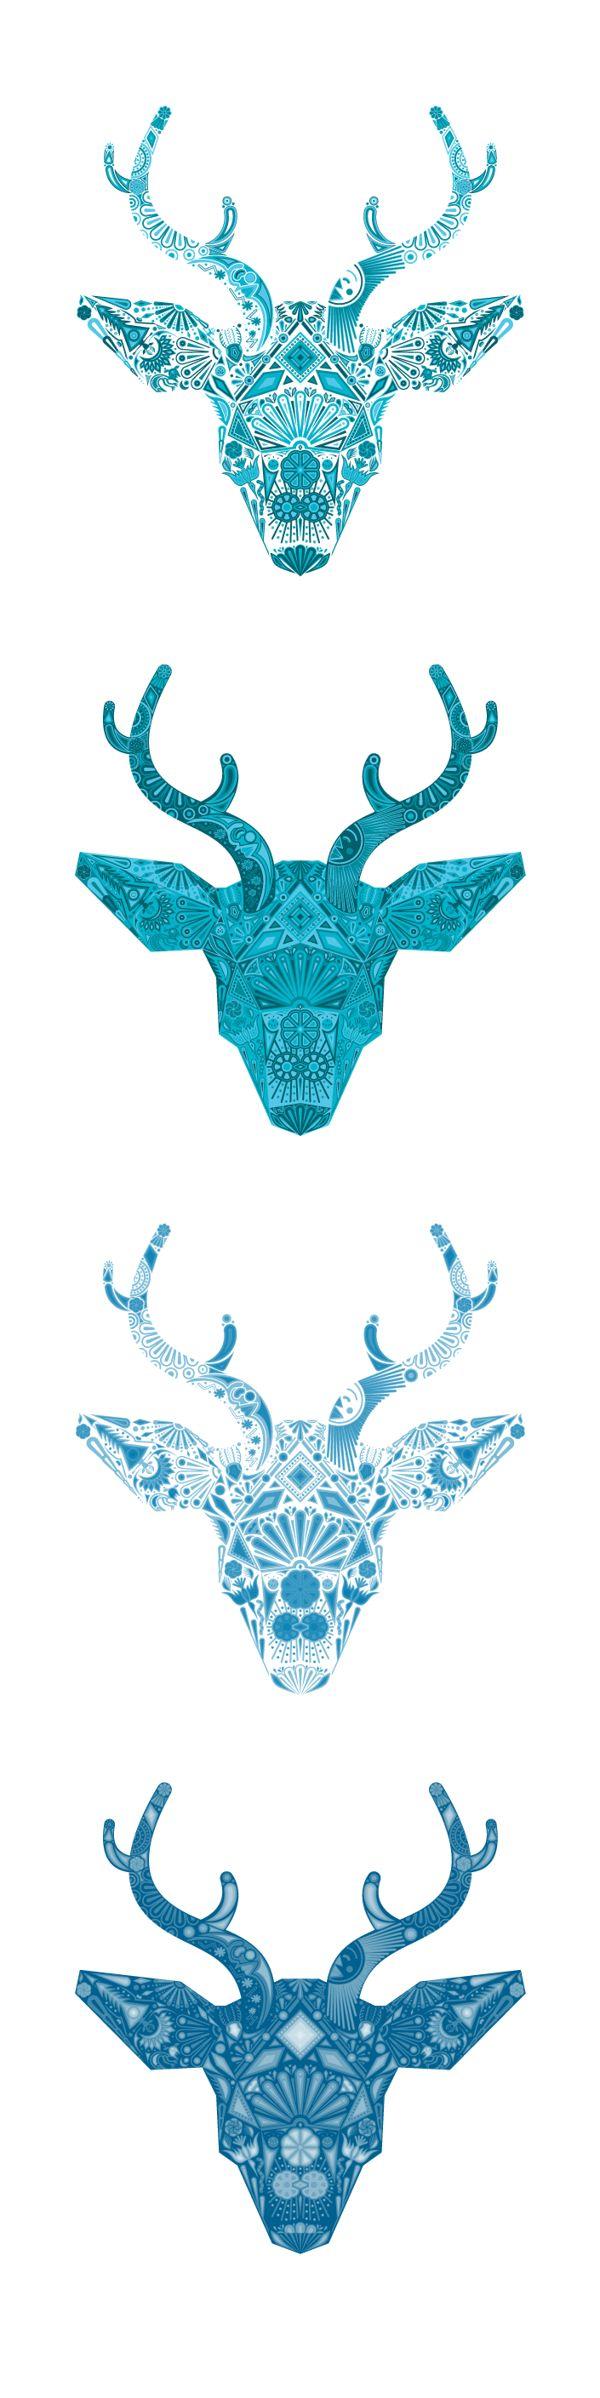 Arte huichol- venado azul